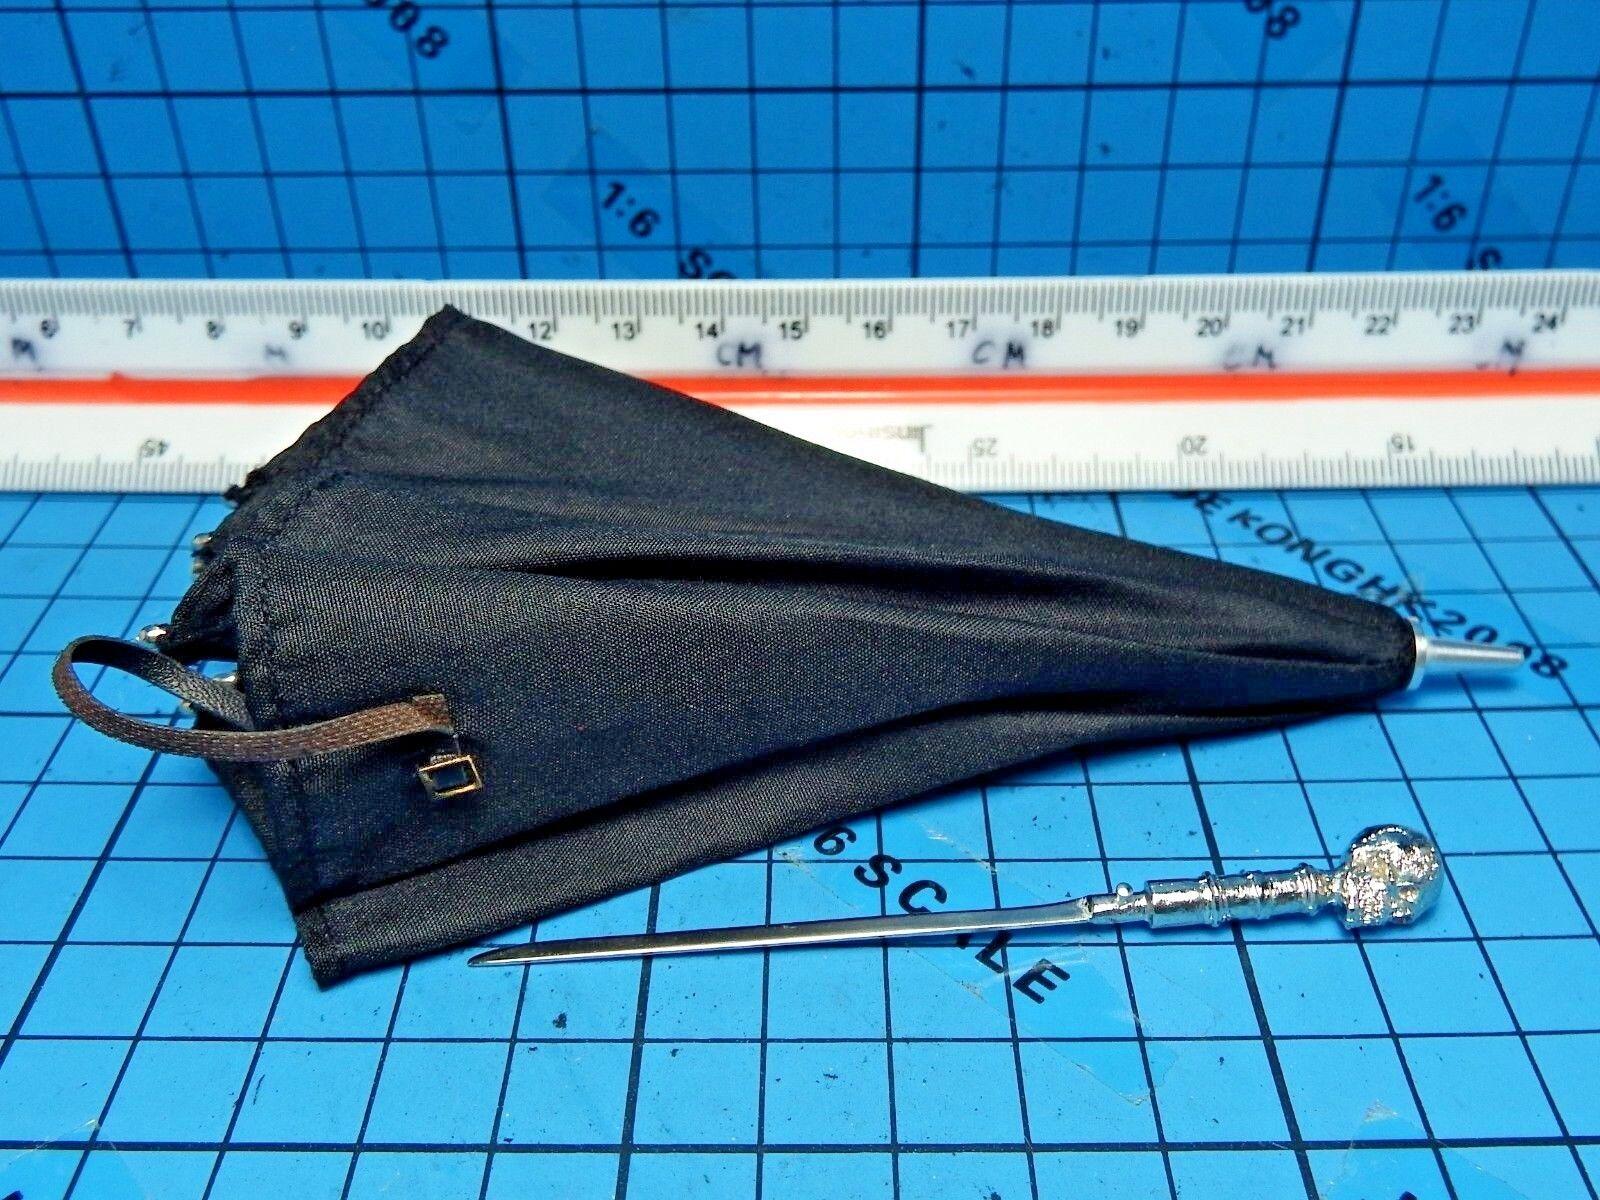 1 6 D80068 Alemán Sd Gestapo DID T. Becker 8th Anni Ver. figura-Excelente paraguas